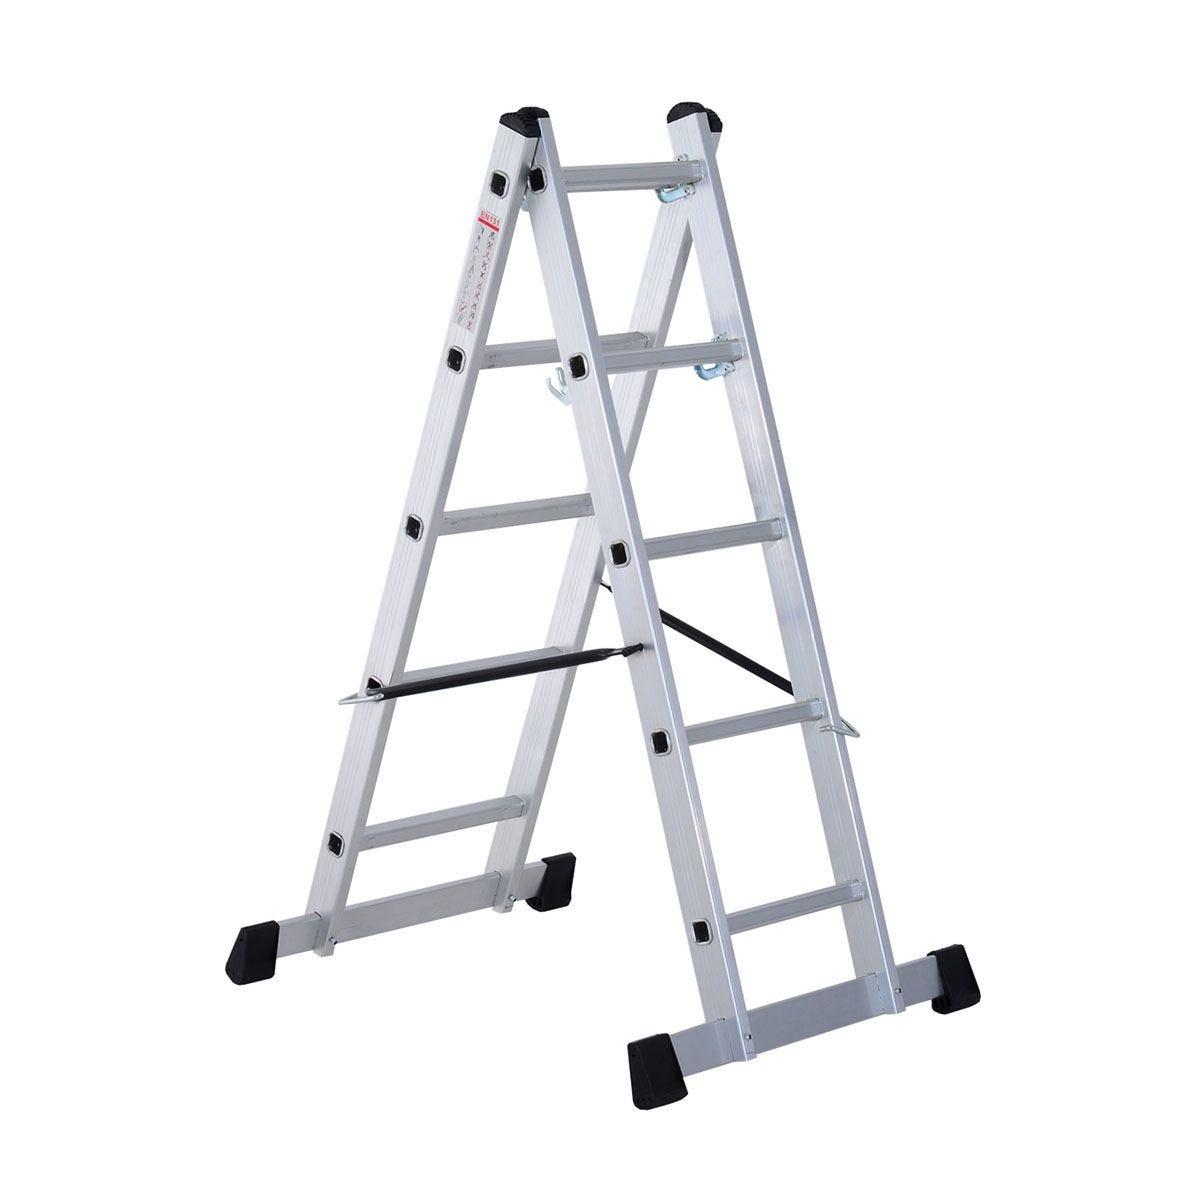 HOMCOM Aluminium Scaffolding Ladder Multi Combination Multi-Purpose Step Scaffold